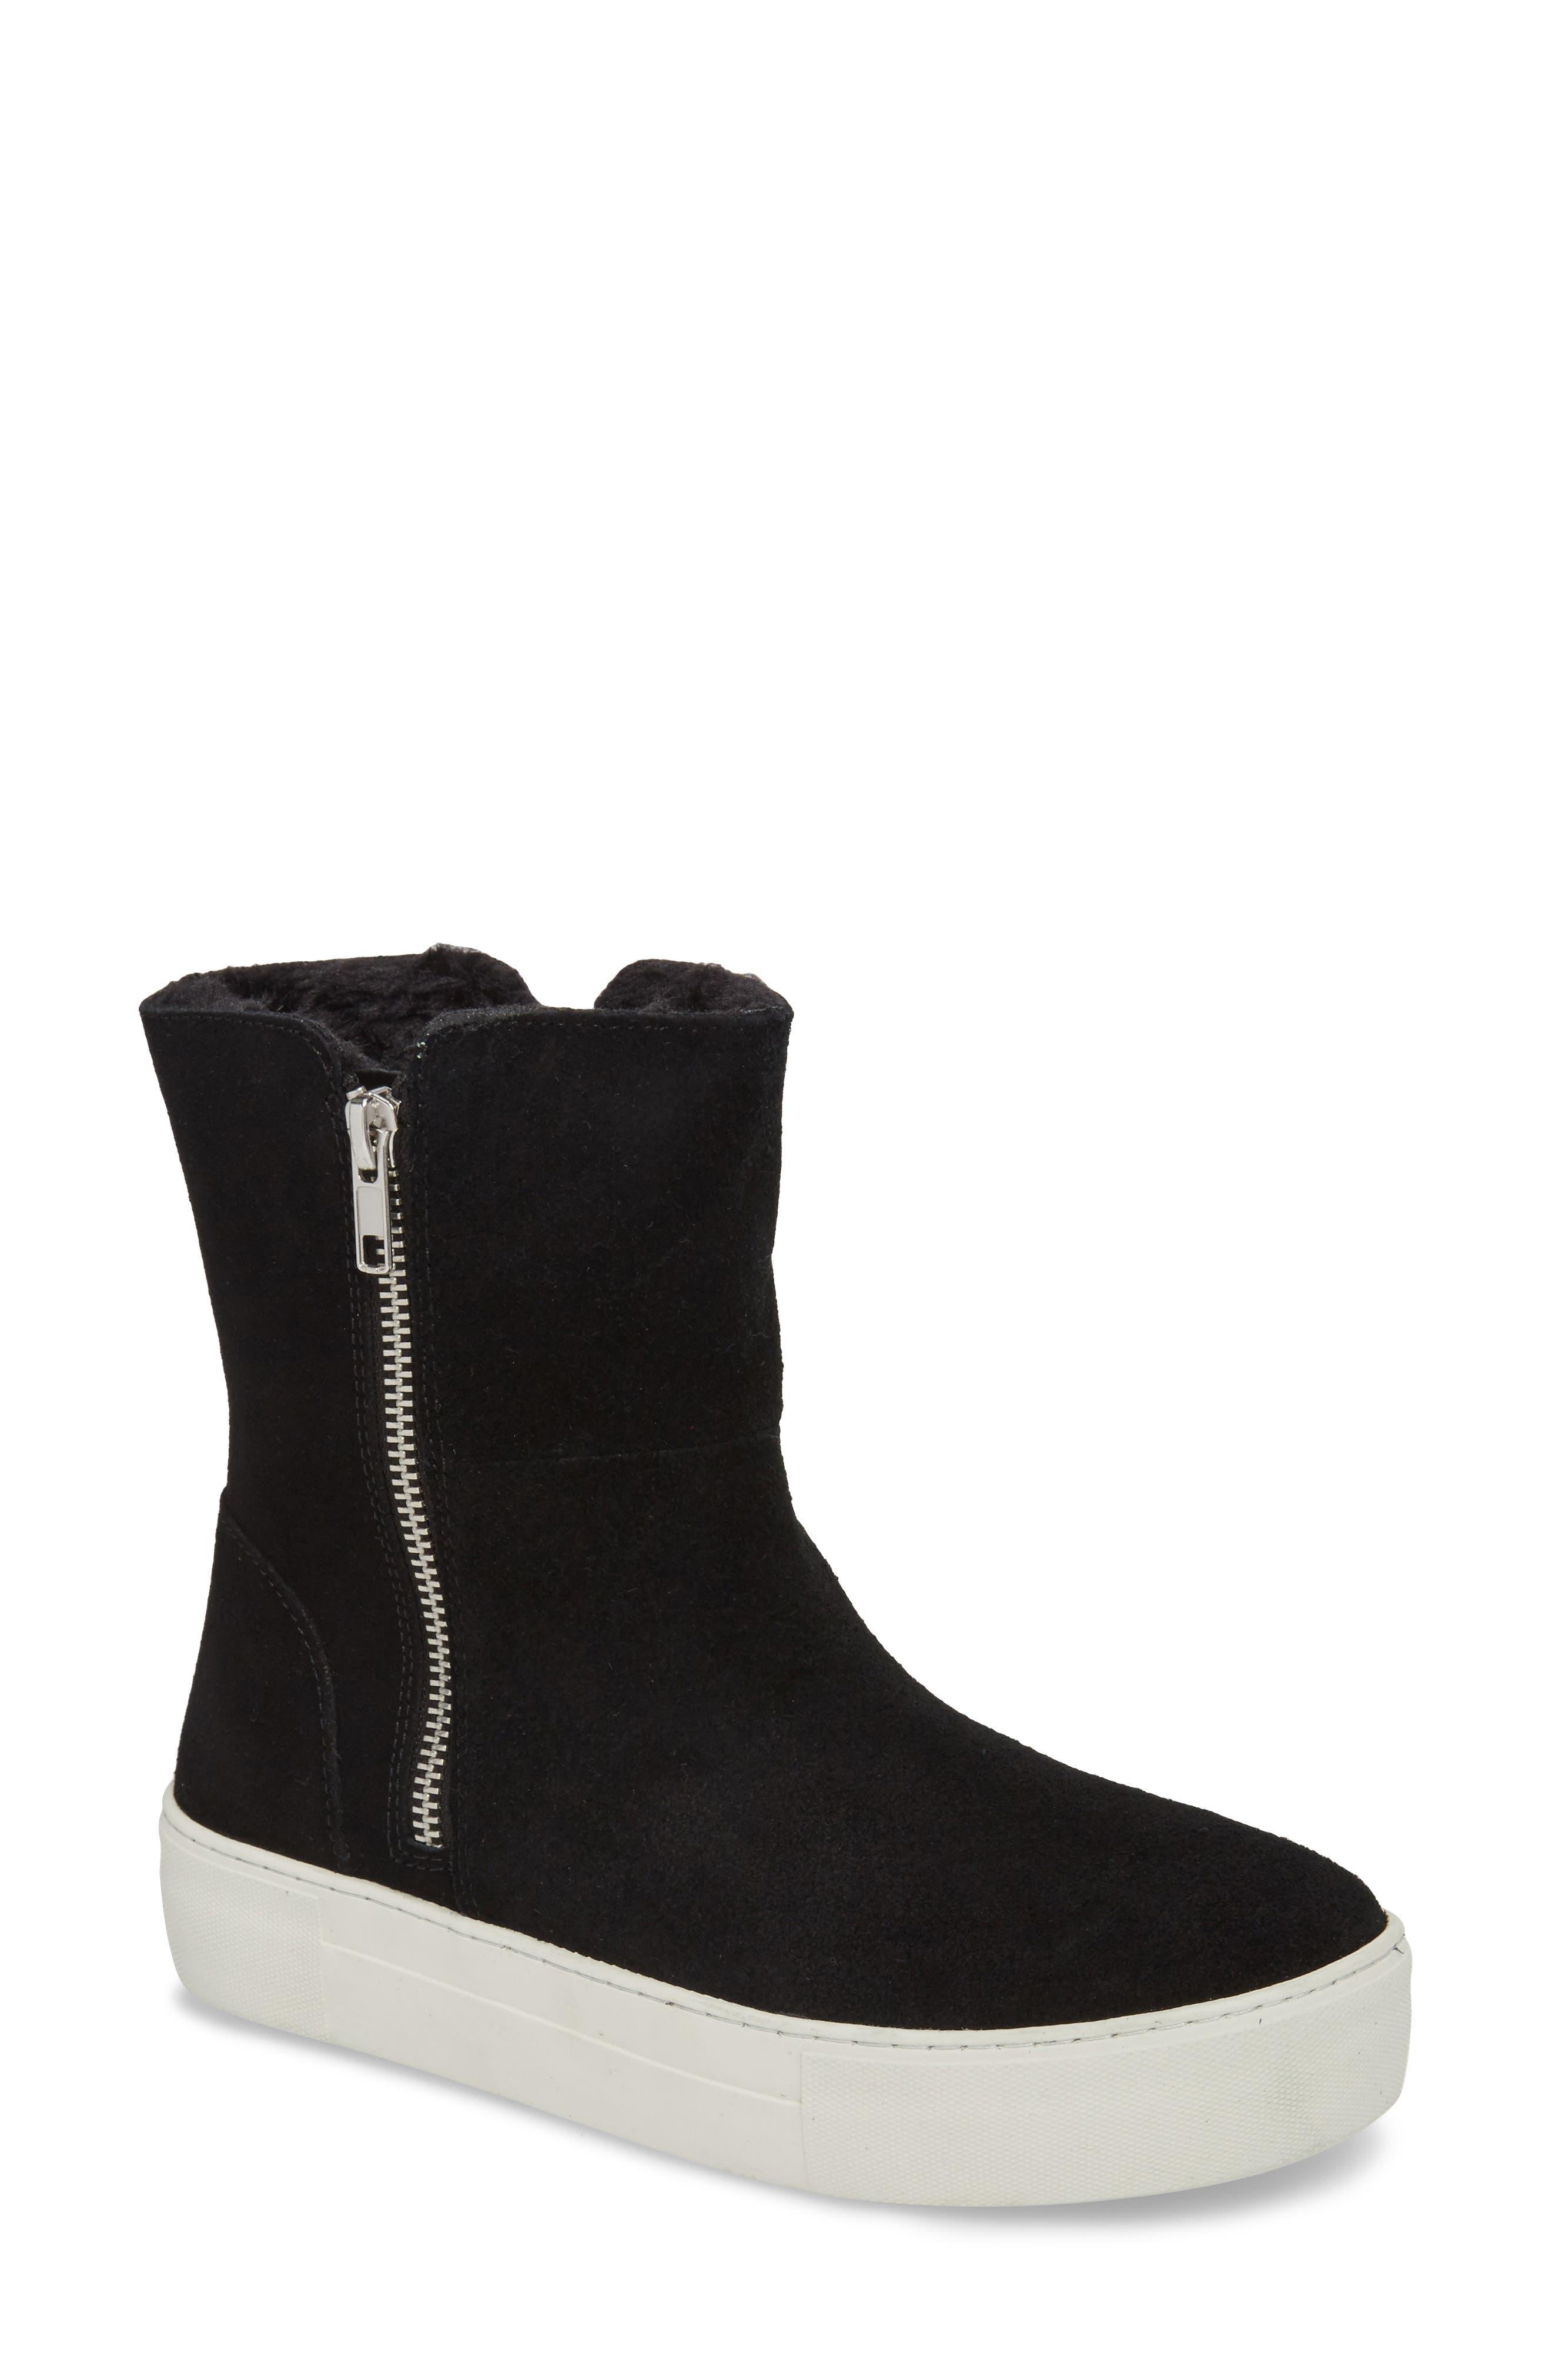 Garrson Sneaker Boot,                         Main,                         color, 006